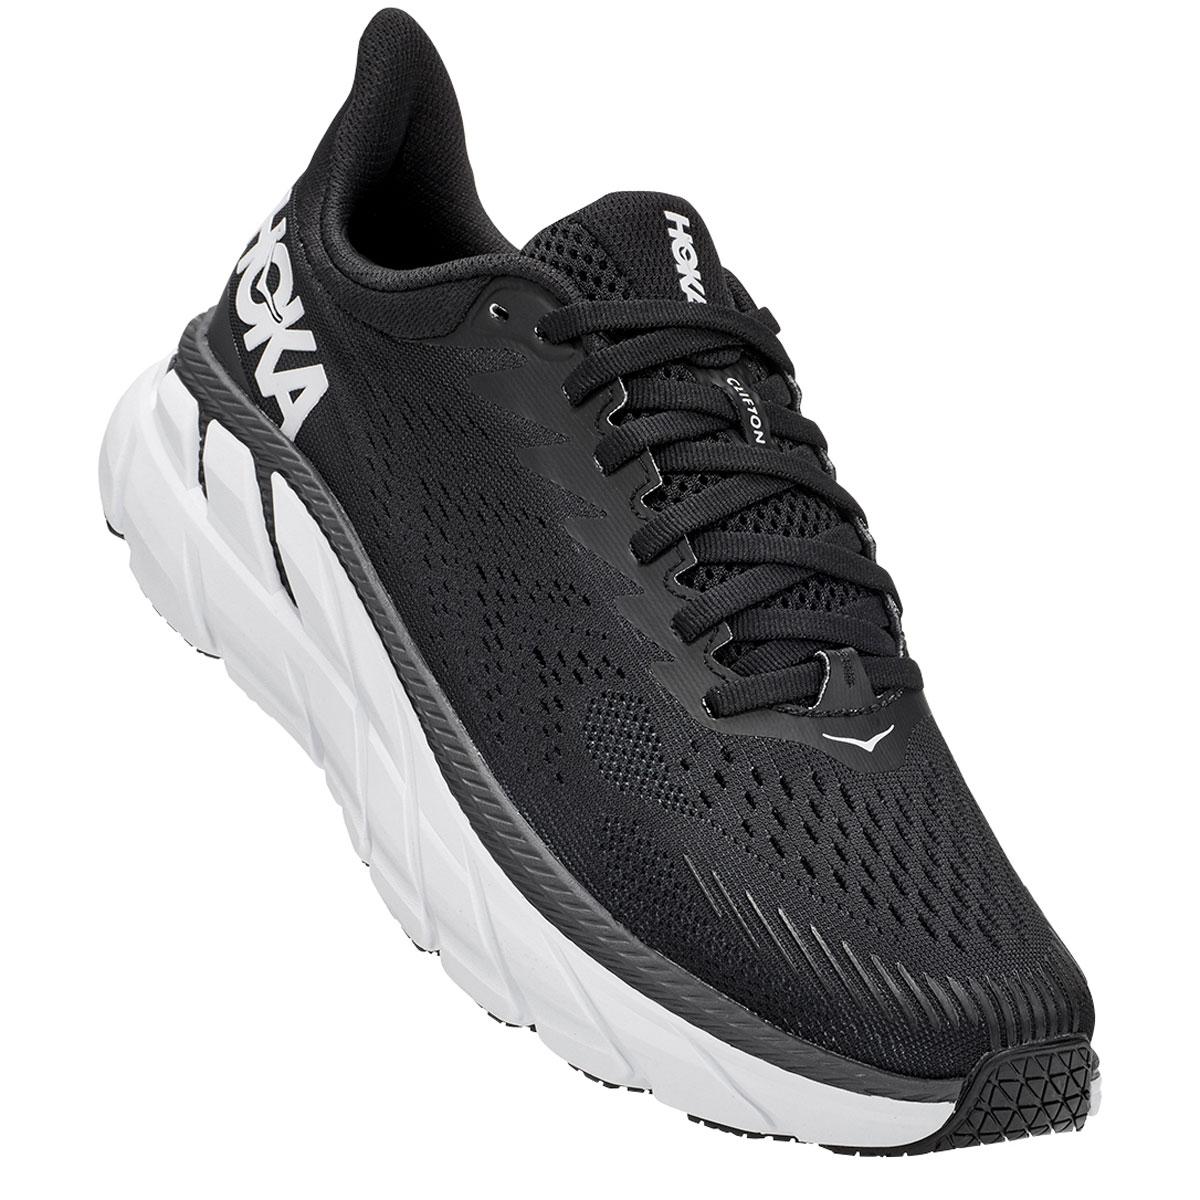 Women's Hoka One One Clifton 7 Running Shoe - Color: Black/White - Size: 5 - Width: Regular, Black/White, large, image 4